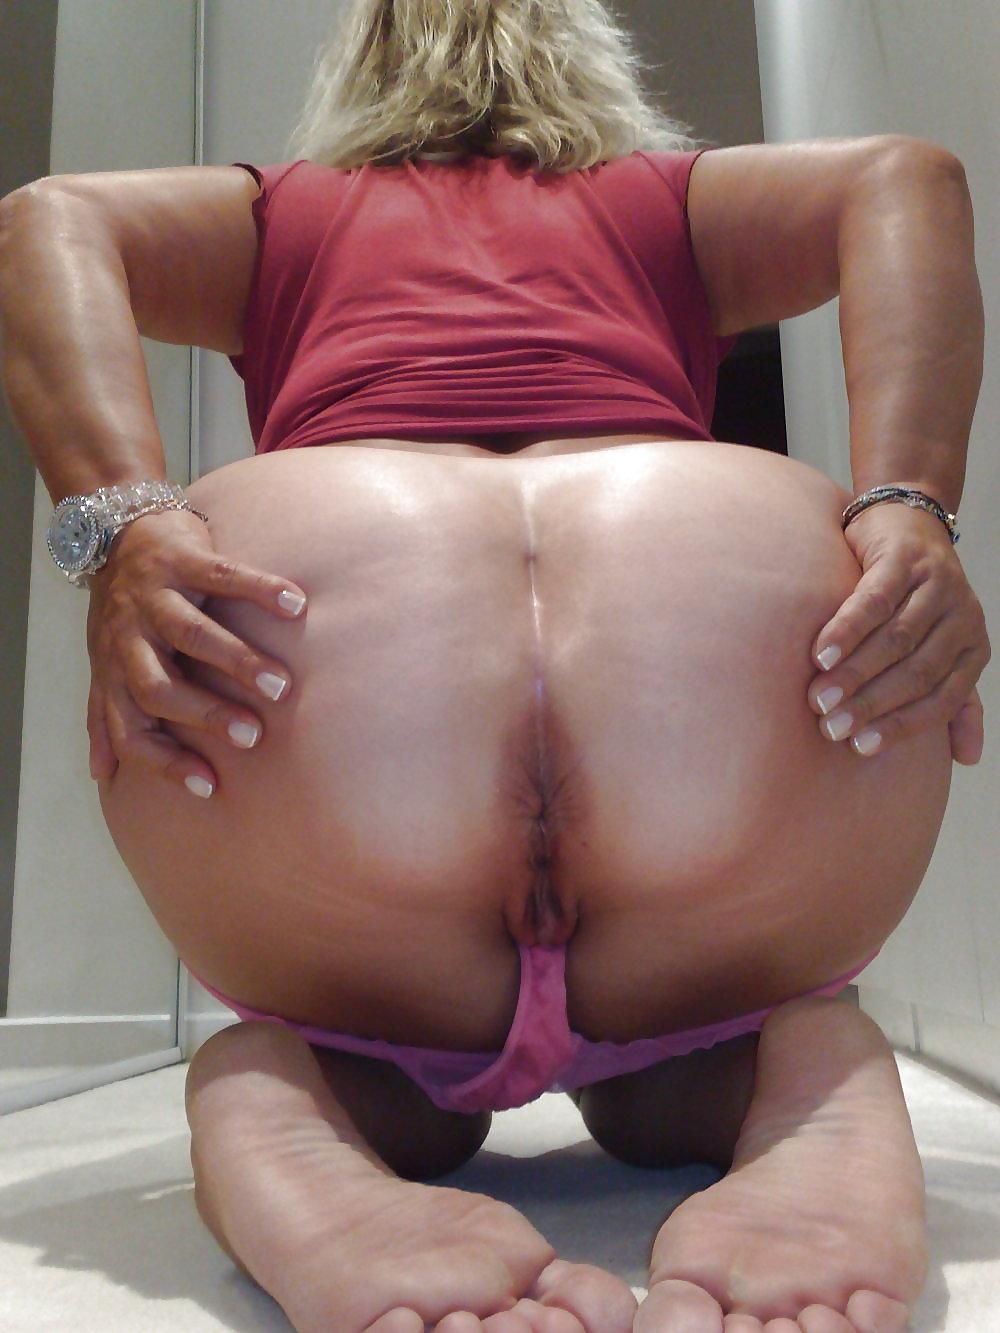 Thick milf ass spread